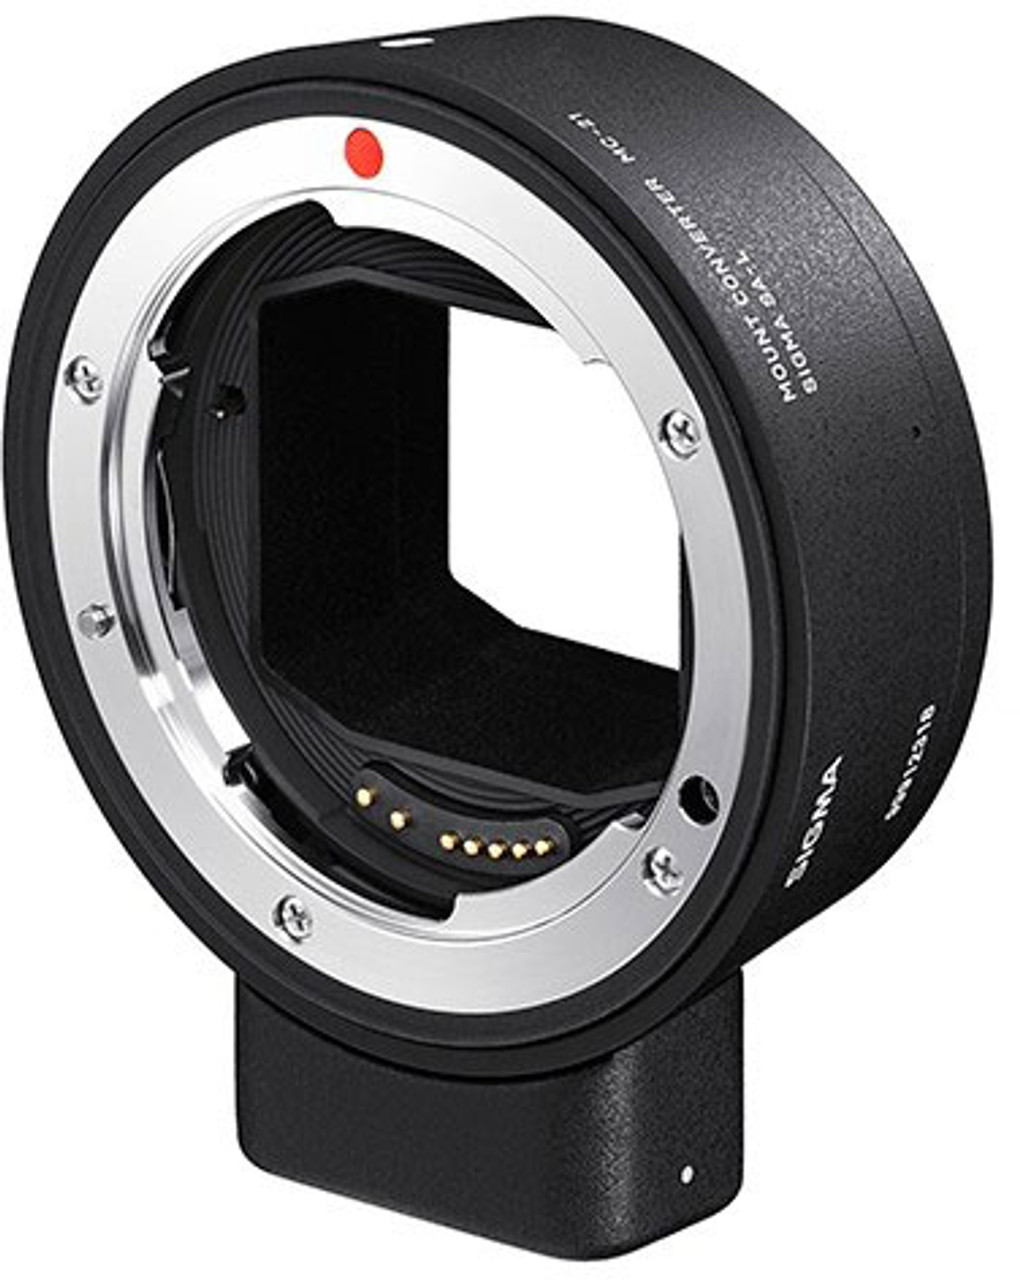 Sigma MC-21 Mount Converter/Lens Adapter (EF-Mount Lenses to L-Mount Camera)